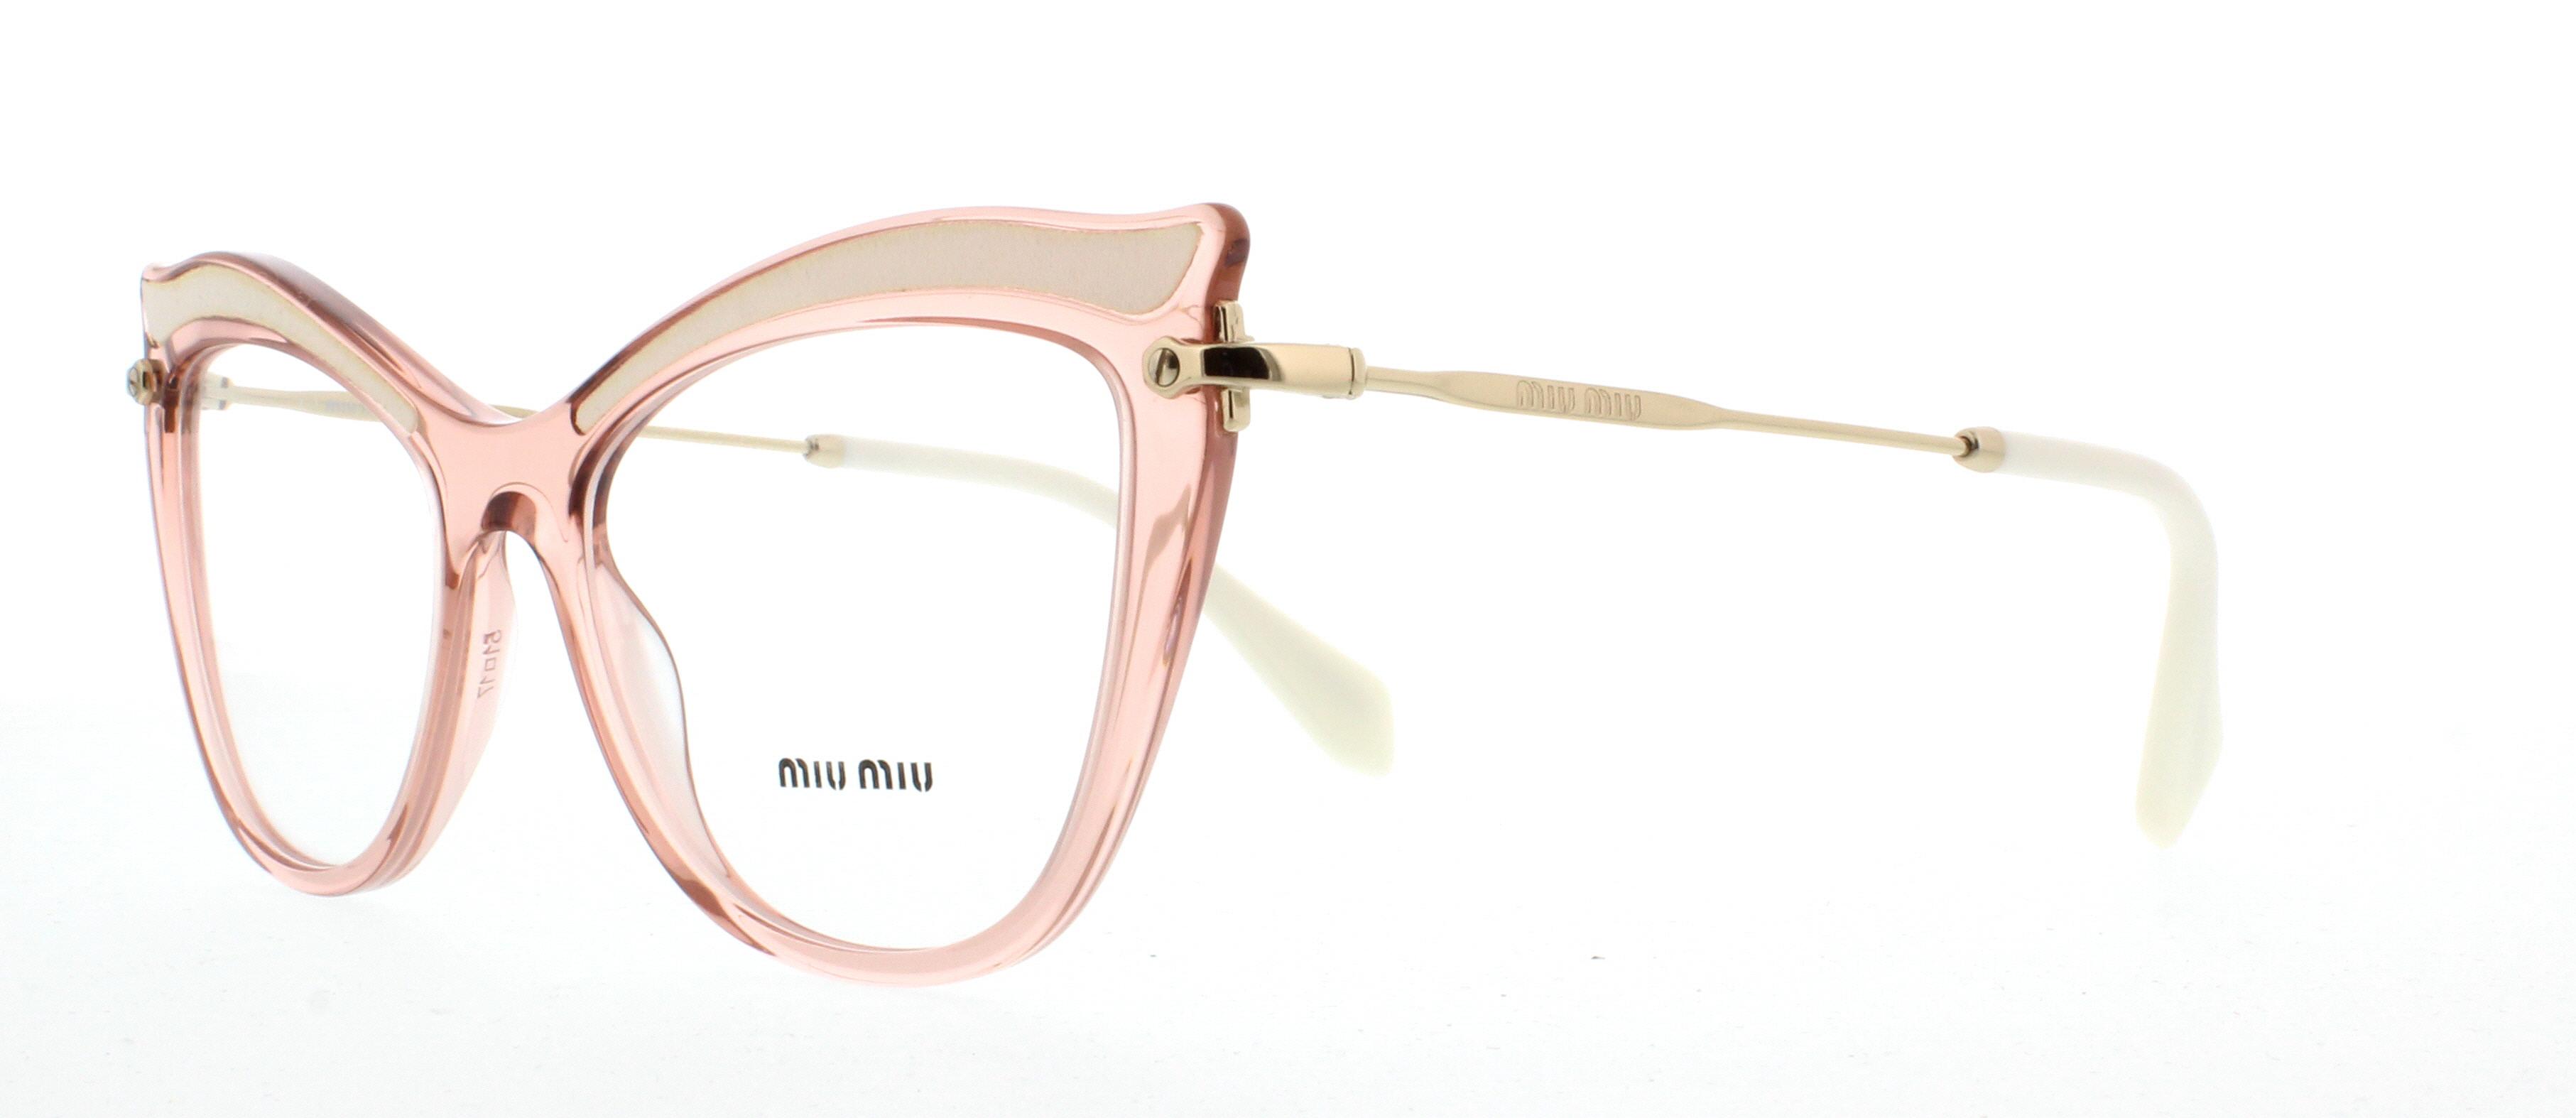 e9380332f529 Miu Miu Pink Glasses Frames - Bitterroot Public Library